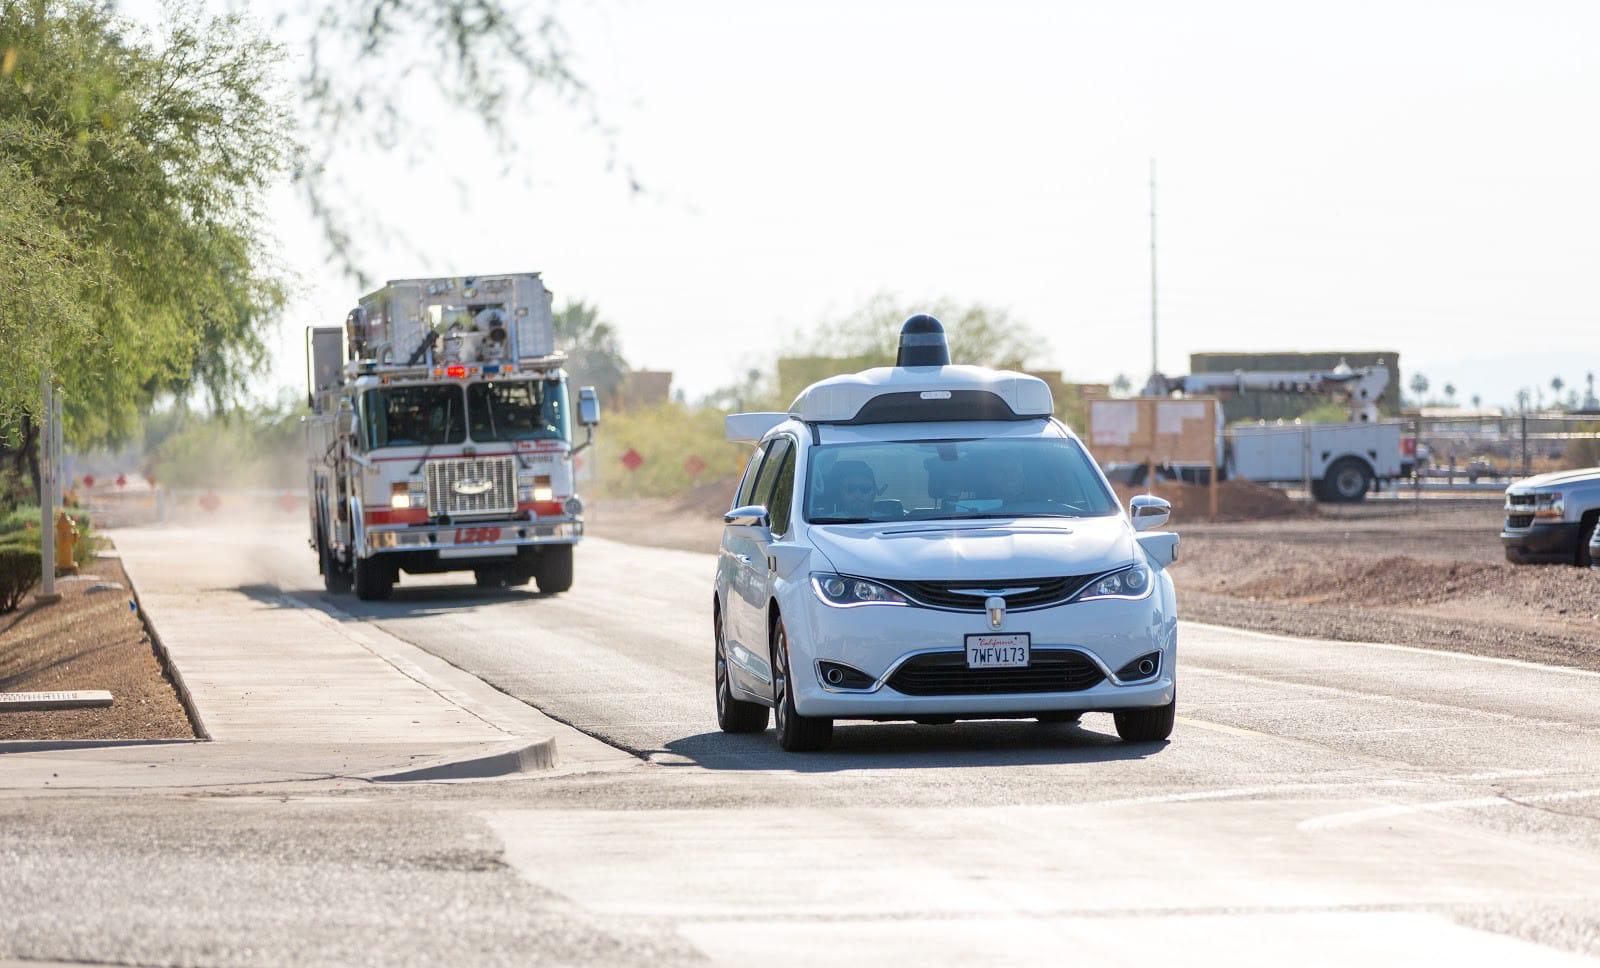 Waymo teaches its autonomous cars to detect emergency vehicles